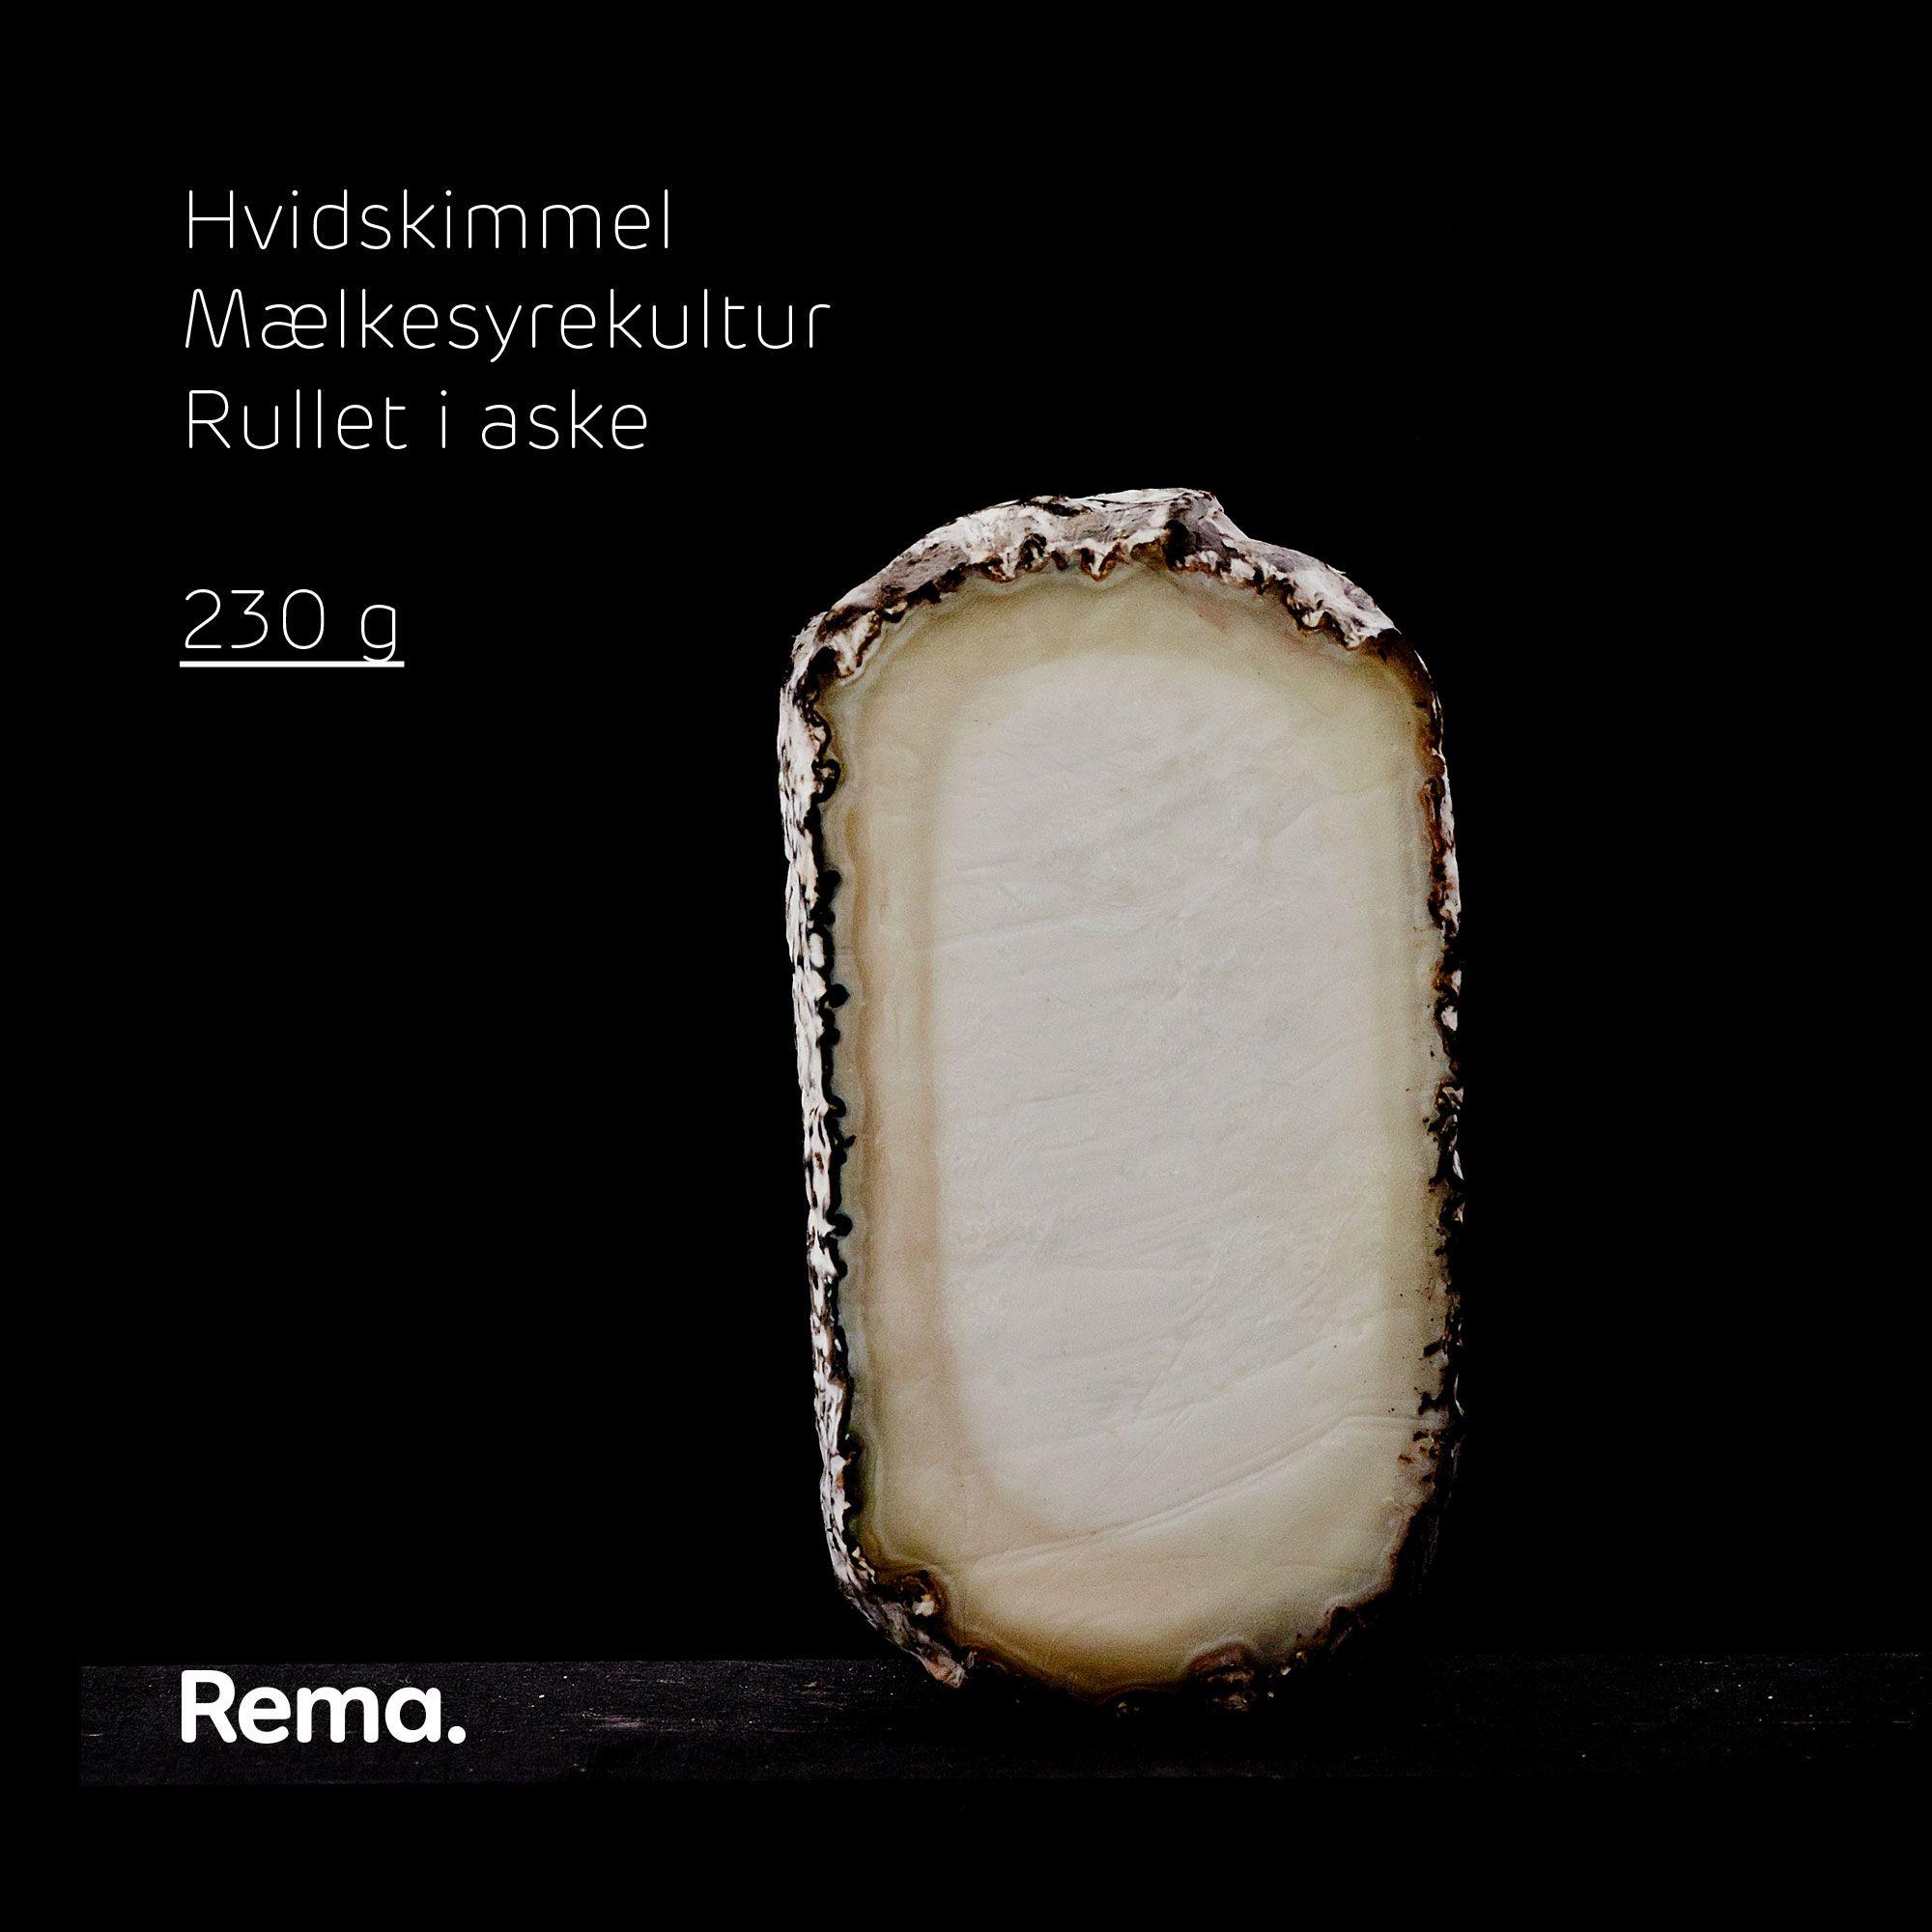 andreas_weiland_rema_hvid